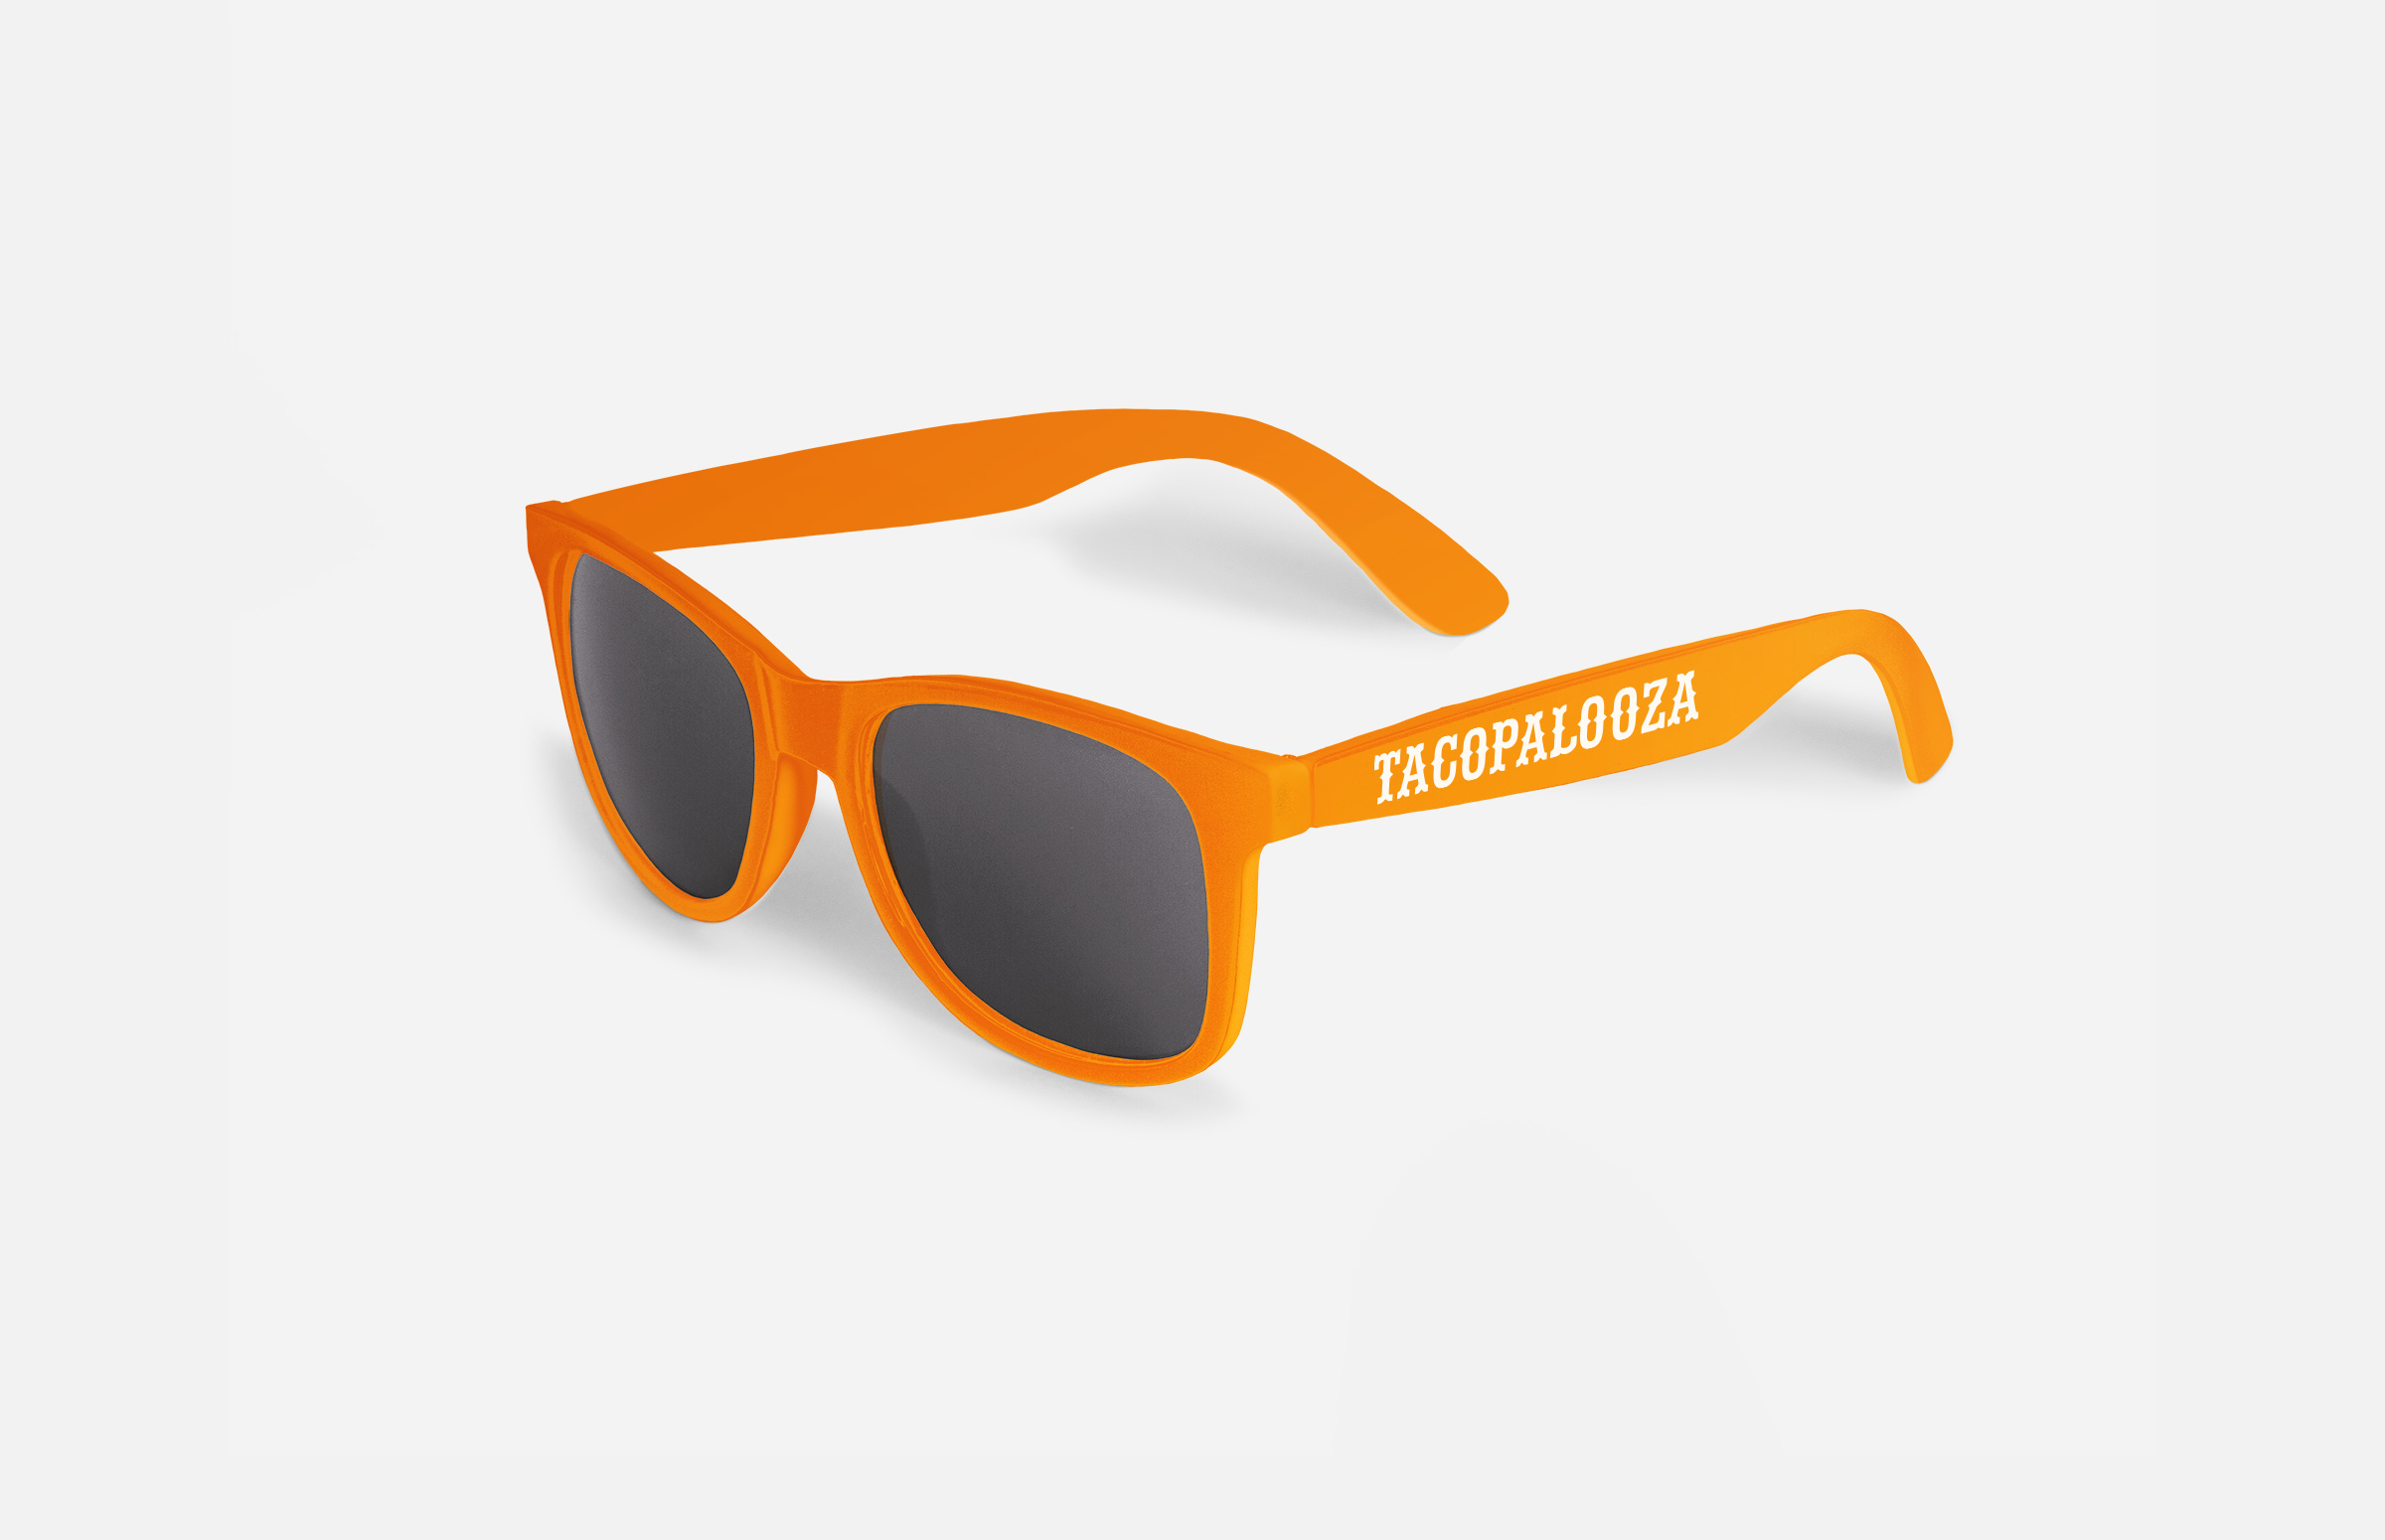 La Food Marketa: Tacopalooza Sunglasses Design